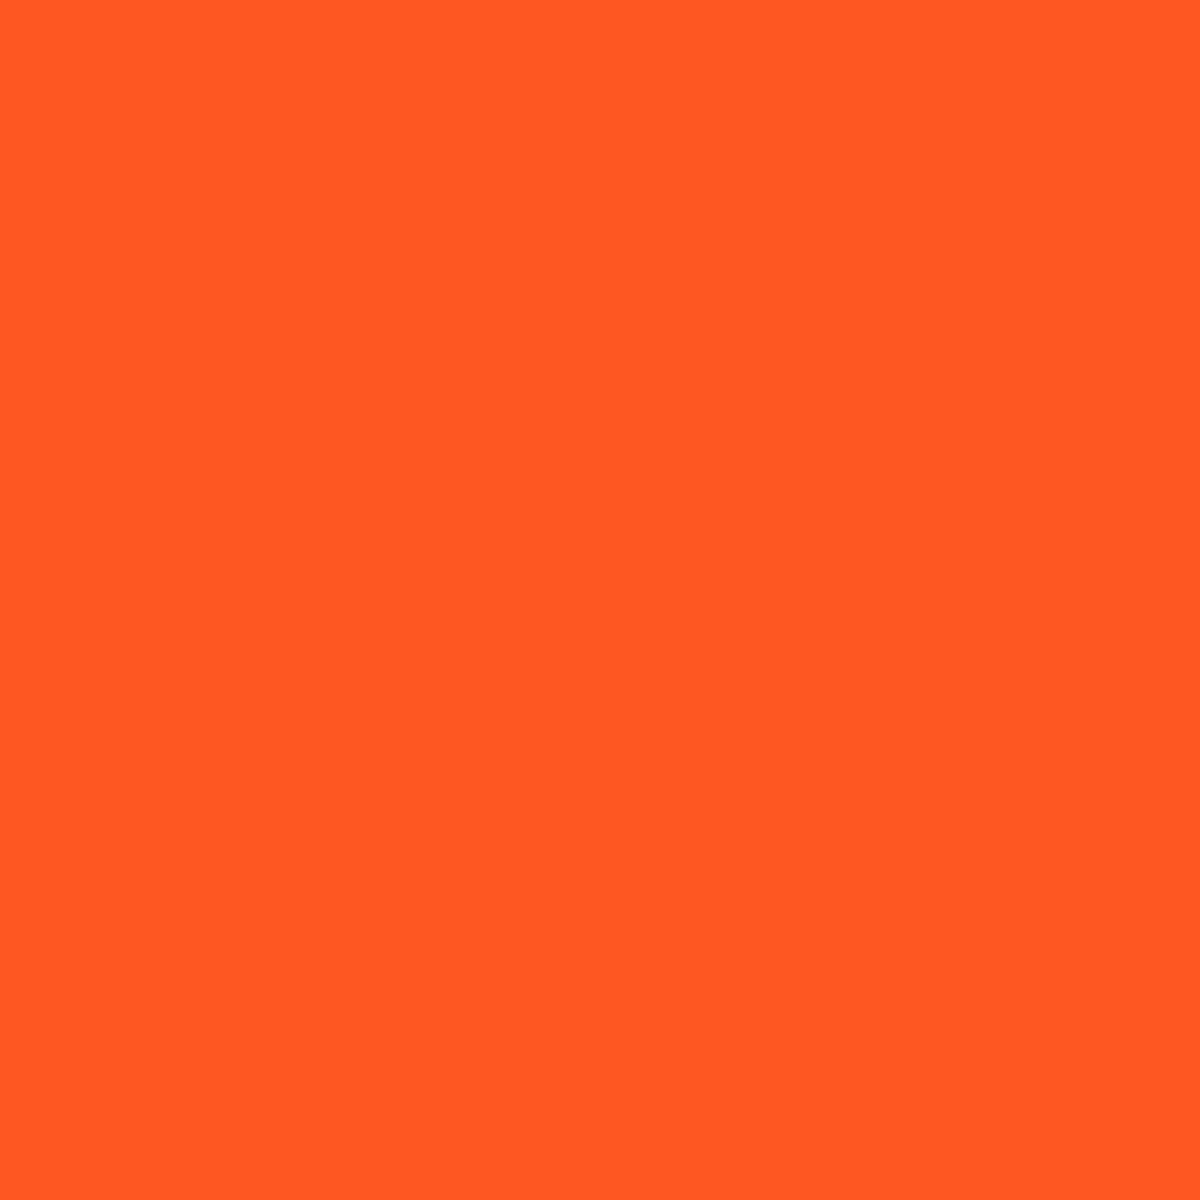 Orange by Rainbow-Boi